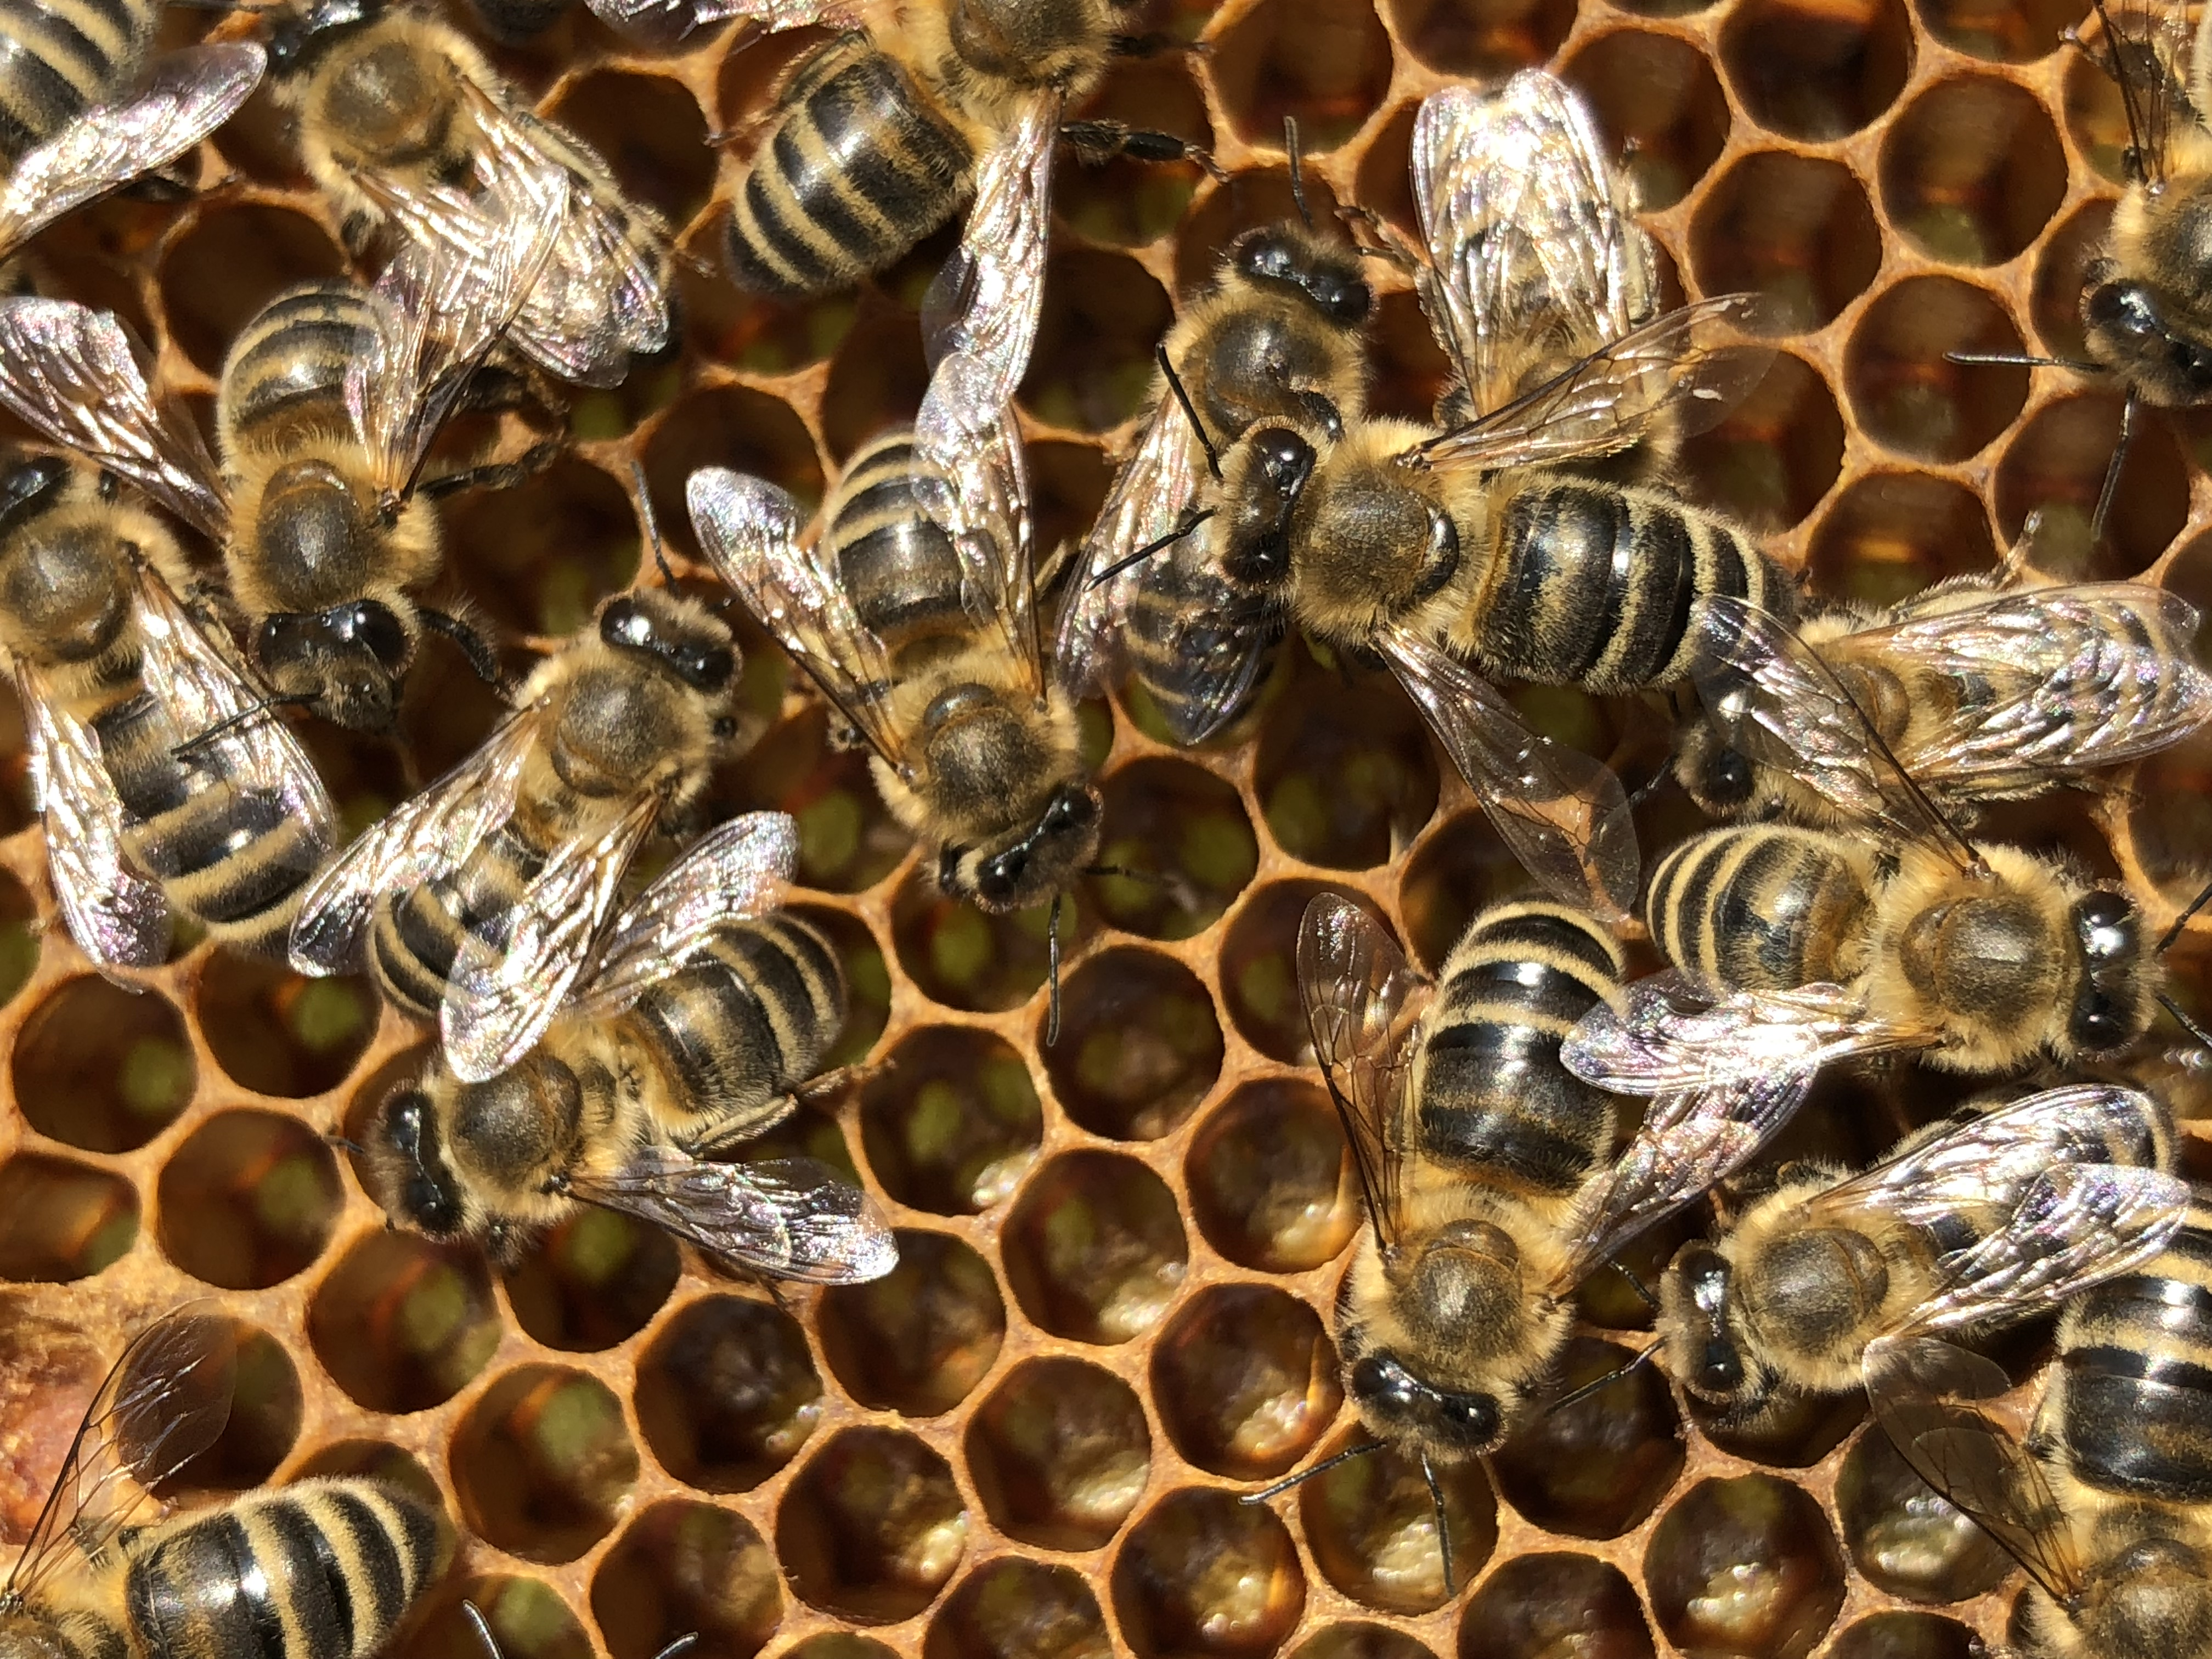 honig-moerfelden-honey-kuhn (63)